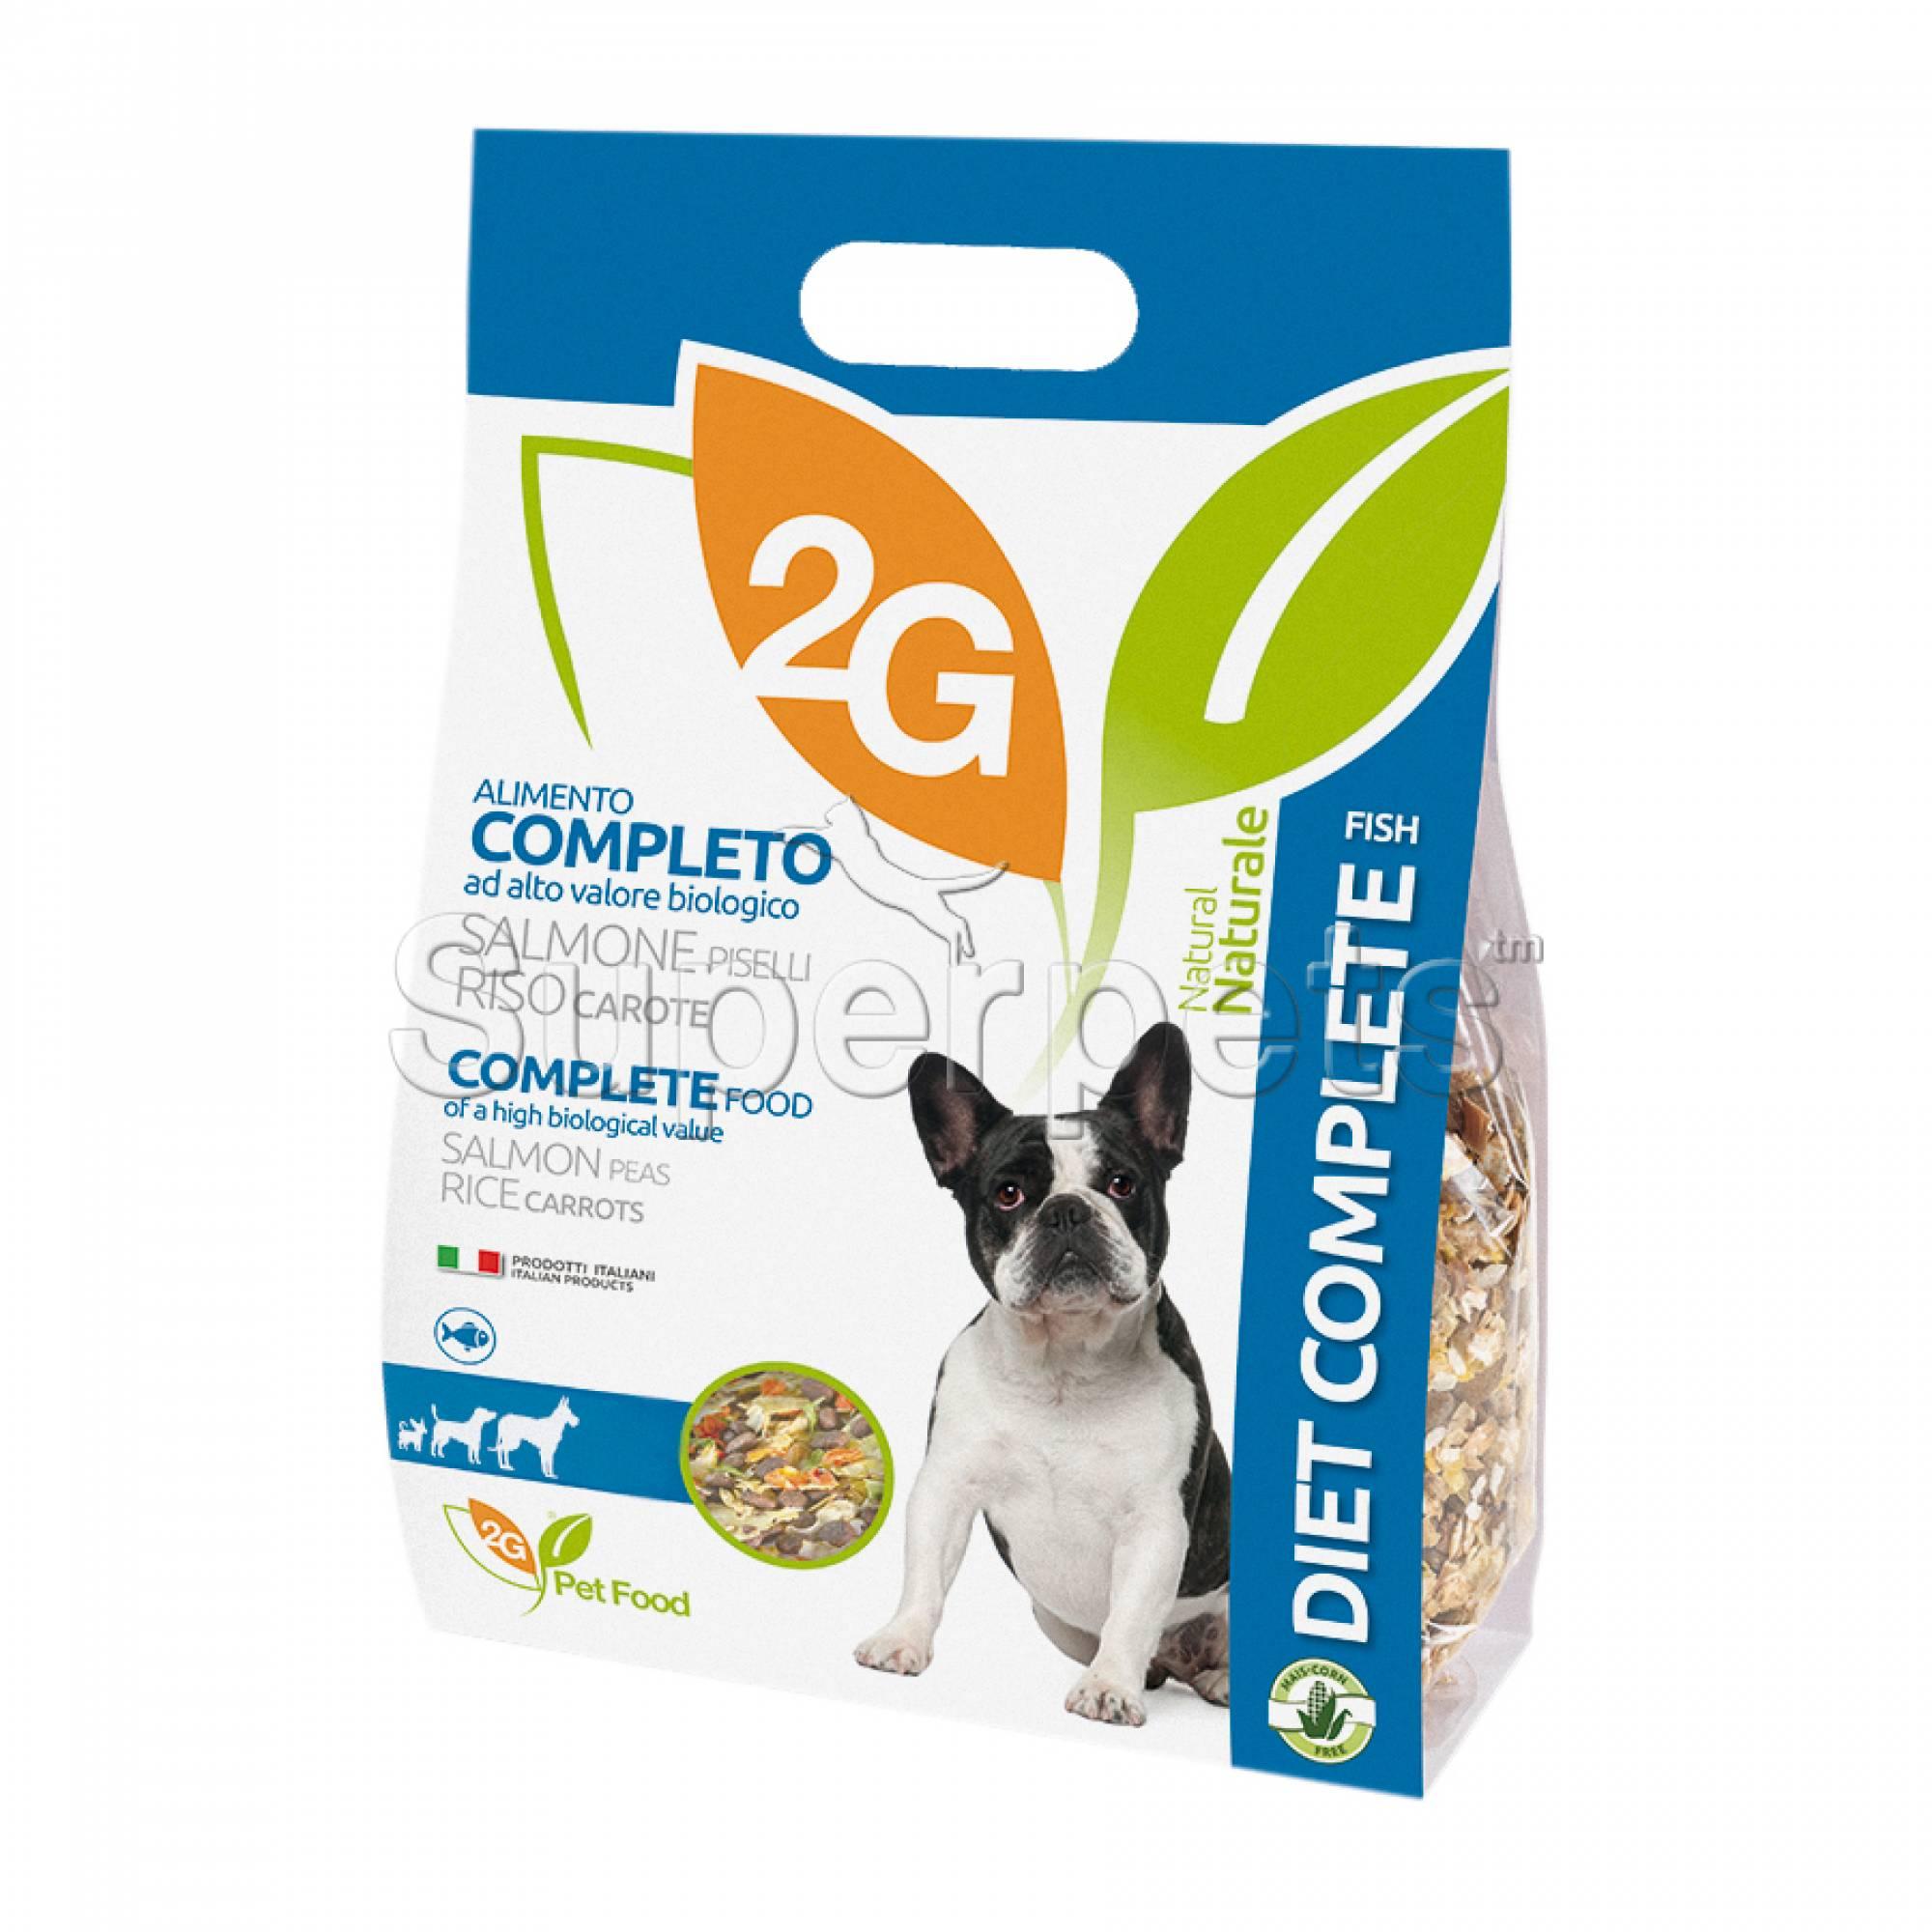 2G Pet Food - Diet Complete Fish 2kg